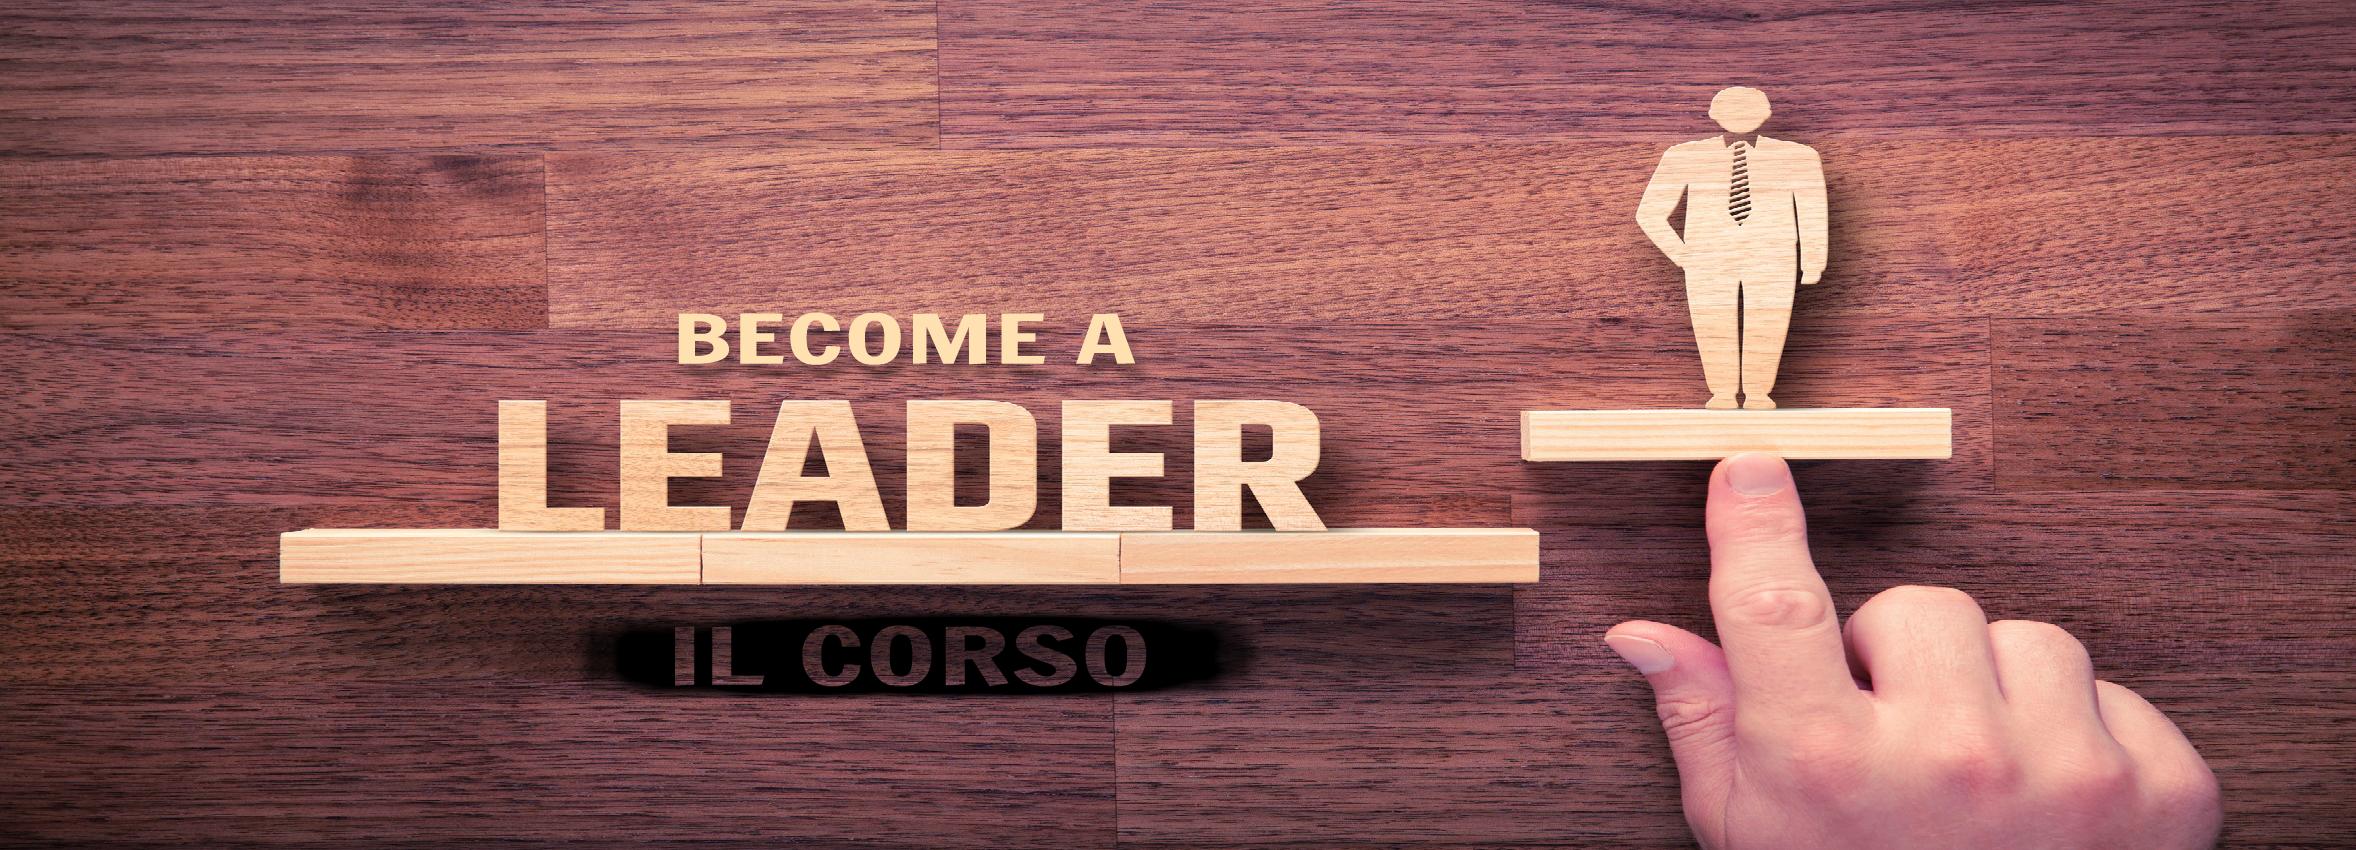 corso-leadership-banner-sito